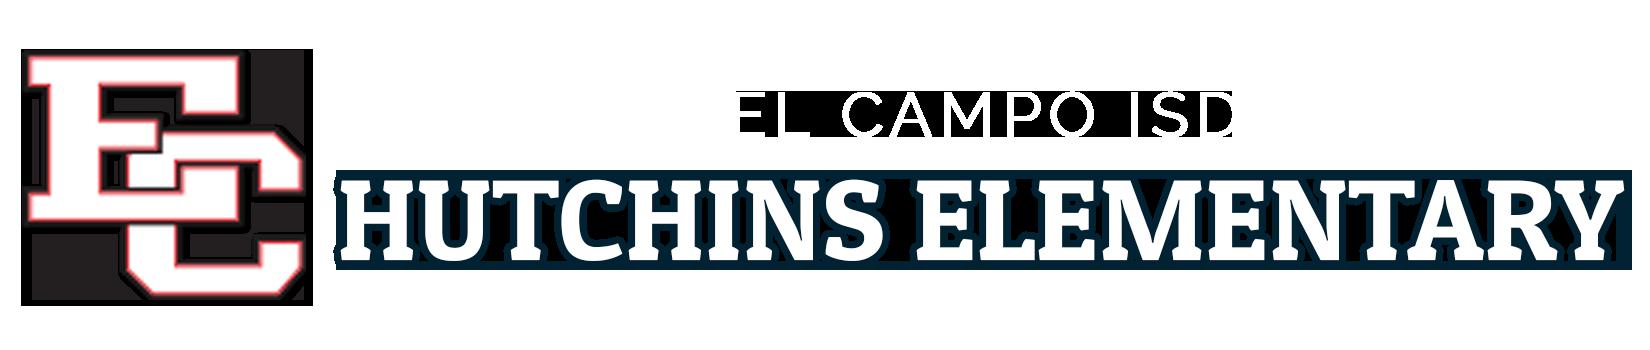 Hutchins Elementary Logo